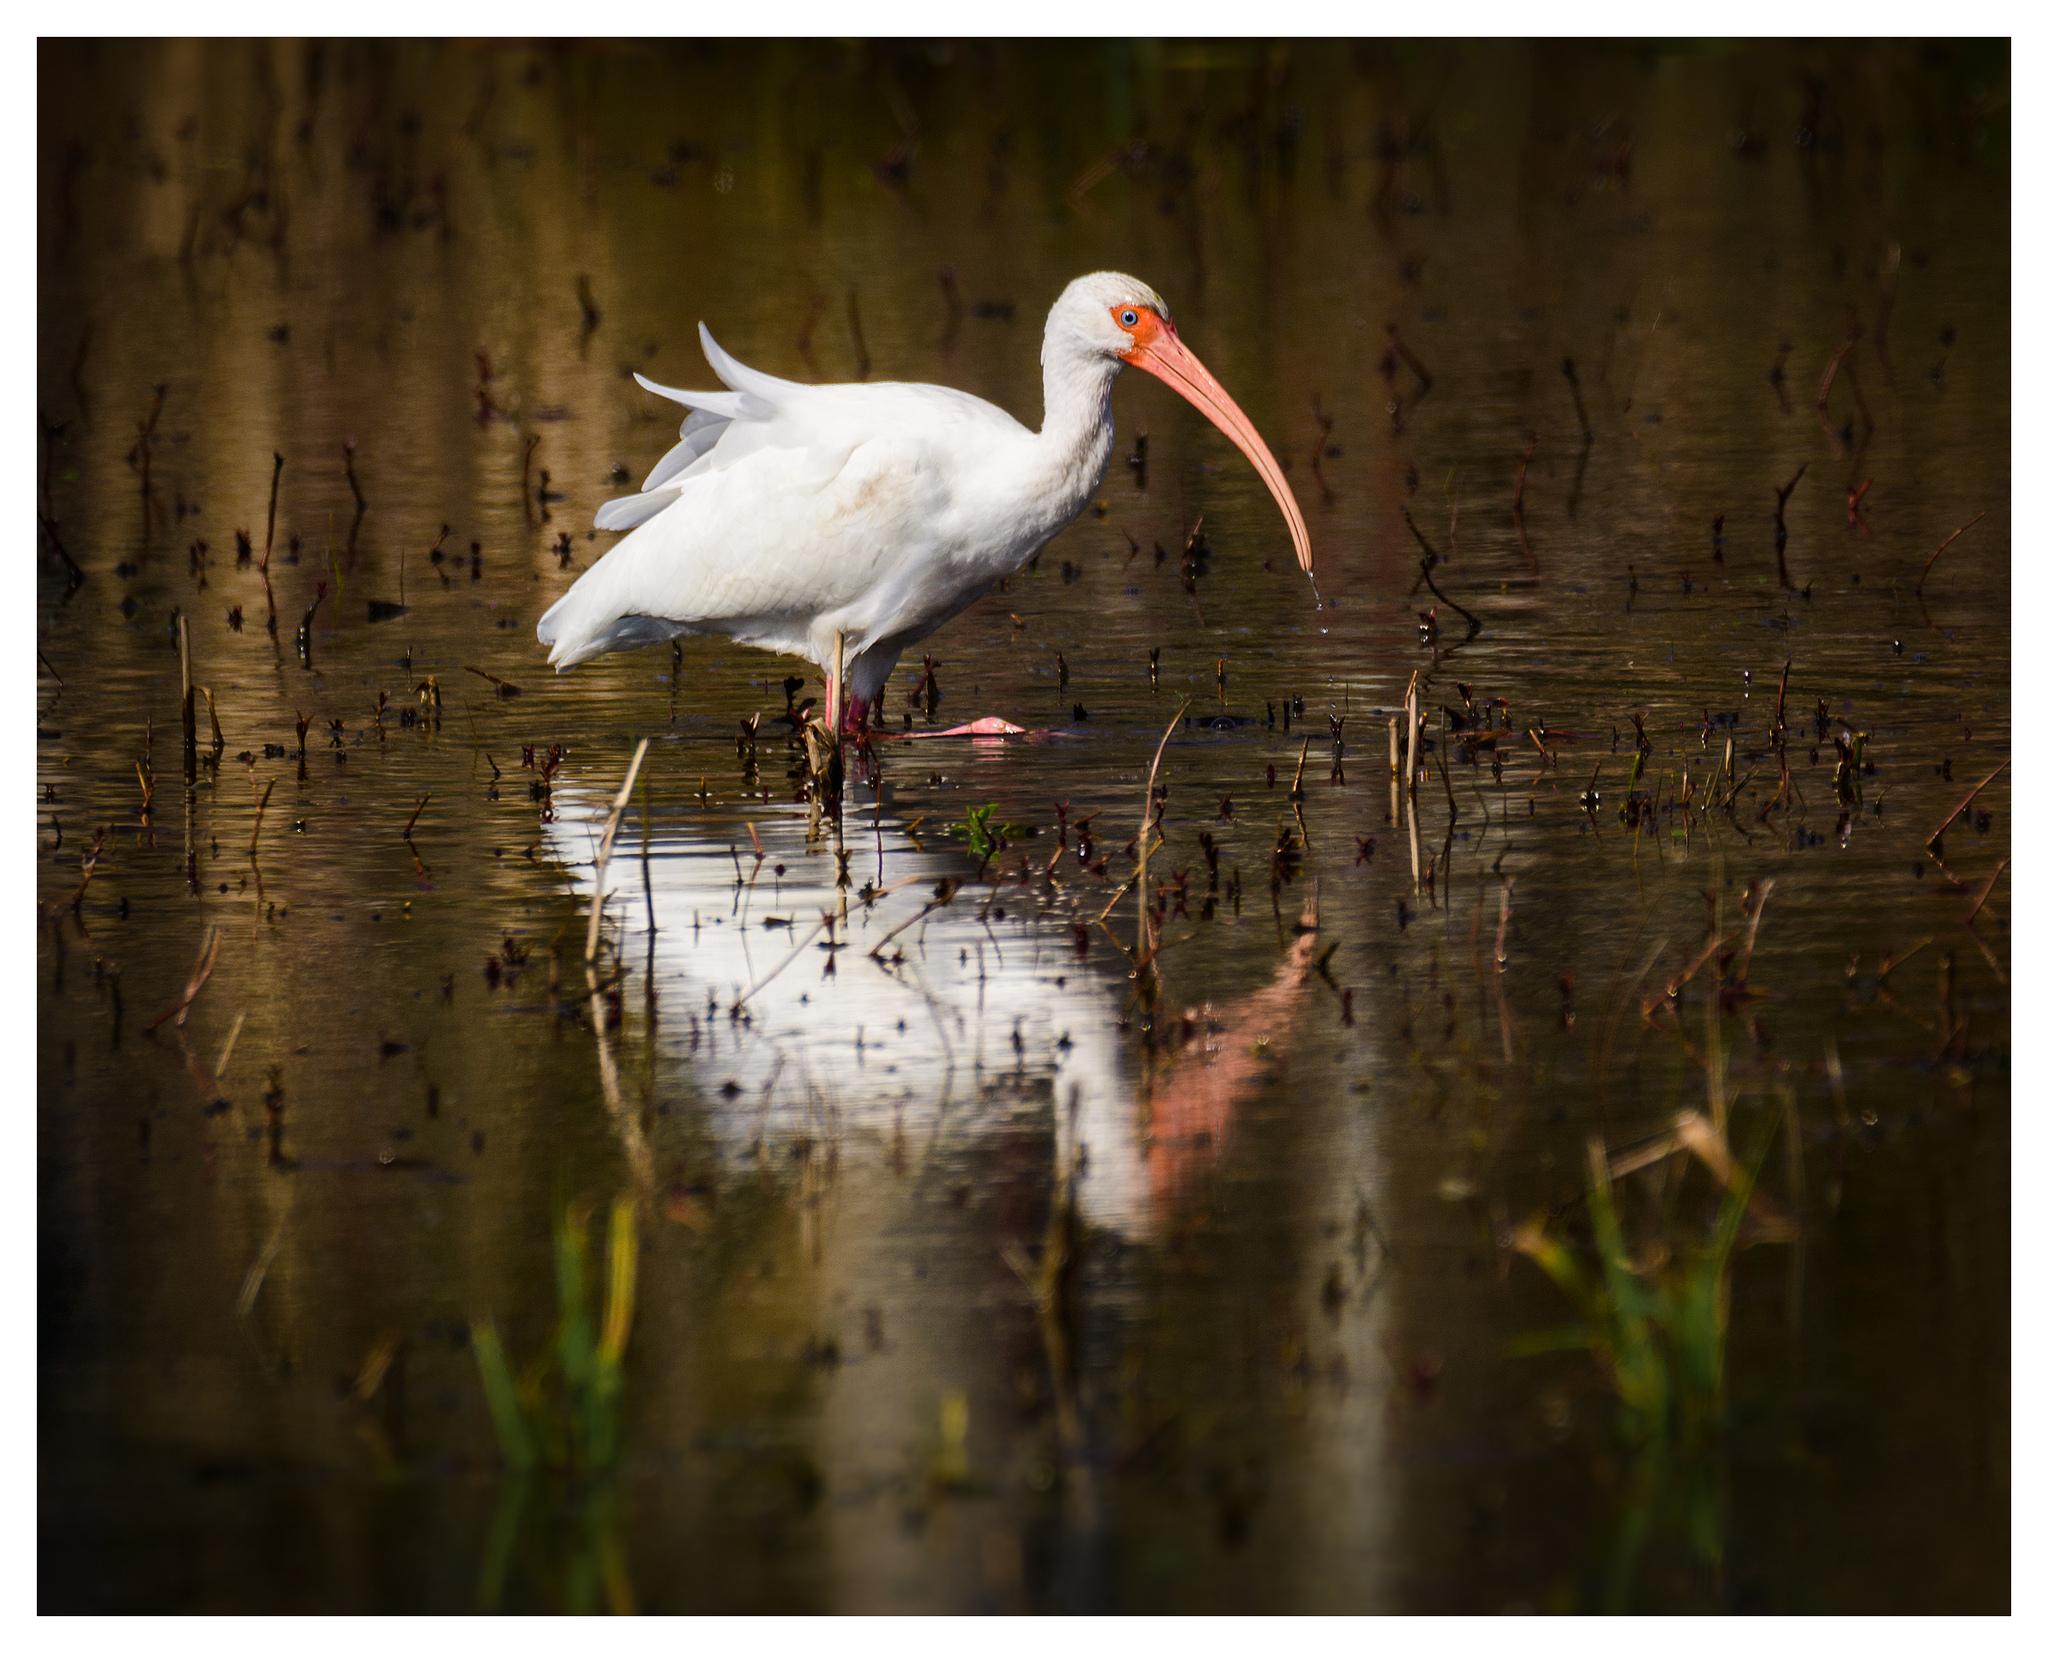 White Ibis at Mattamuskeet - Nikon D500 w/Tamron 150-600mm lens